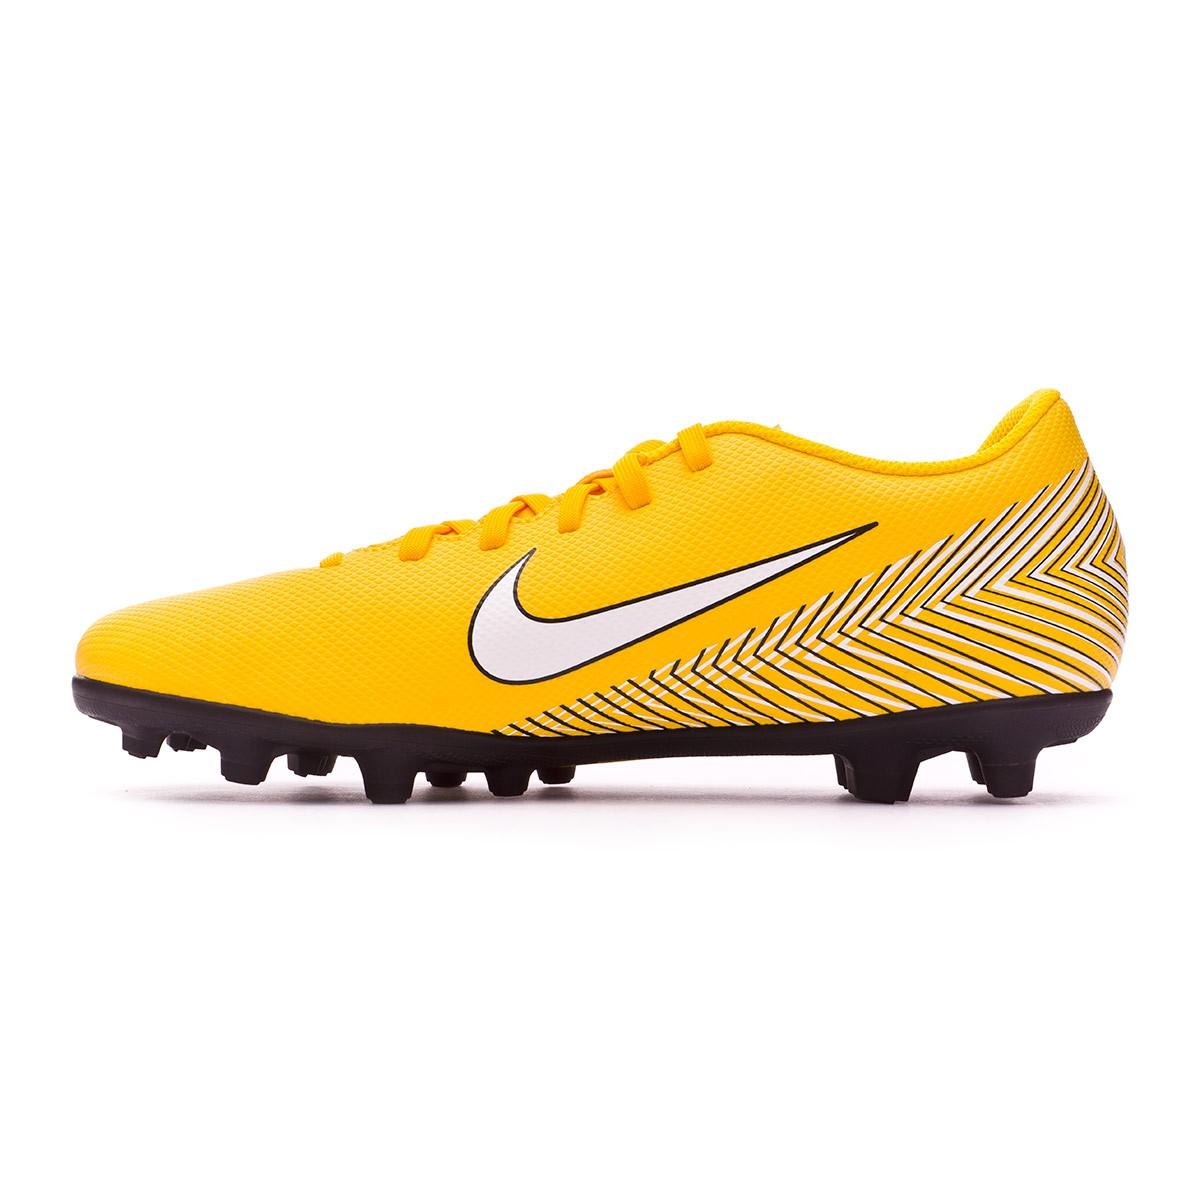 check out 9b99c 54d78 Scarpe Nike Mercurial Vapor XII Club MG Neymar Yellow-Black - Negozio di  calcio Fútbol Emotion